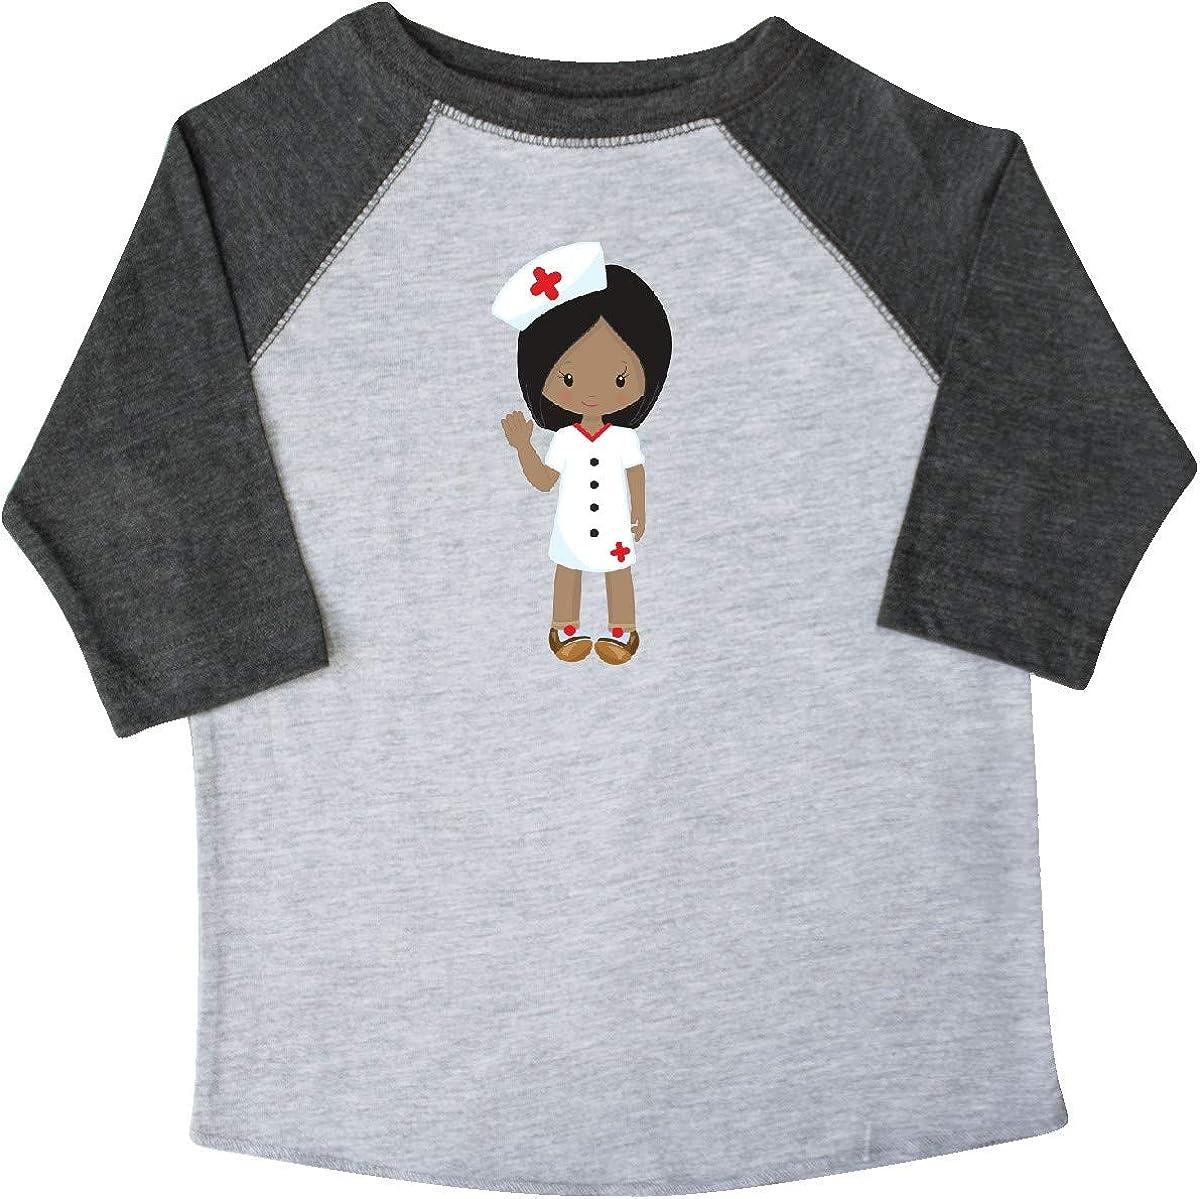 Nurse Uniform Toddler T-Shirt Nurse inktastic African American Girl